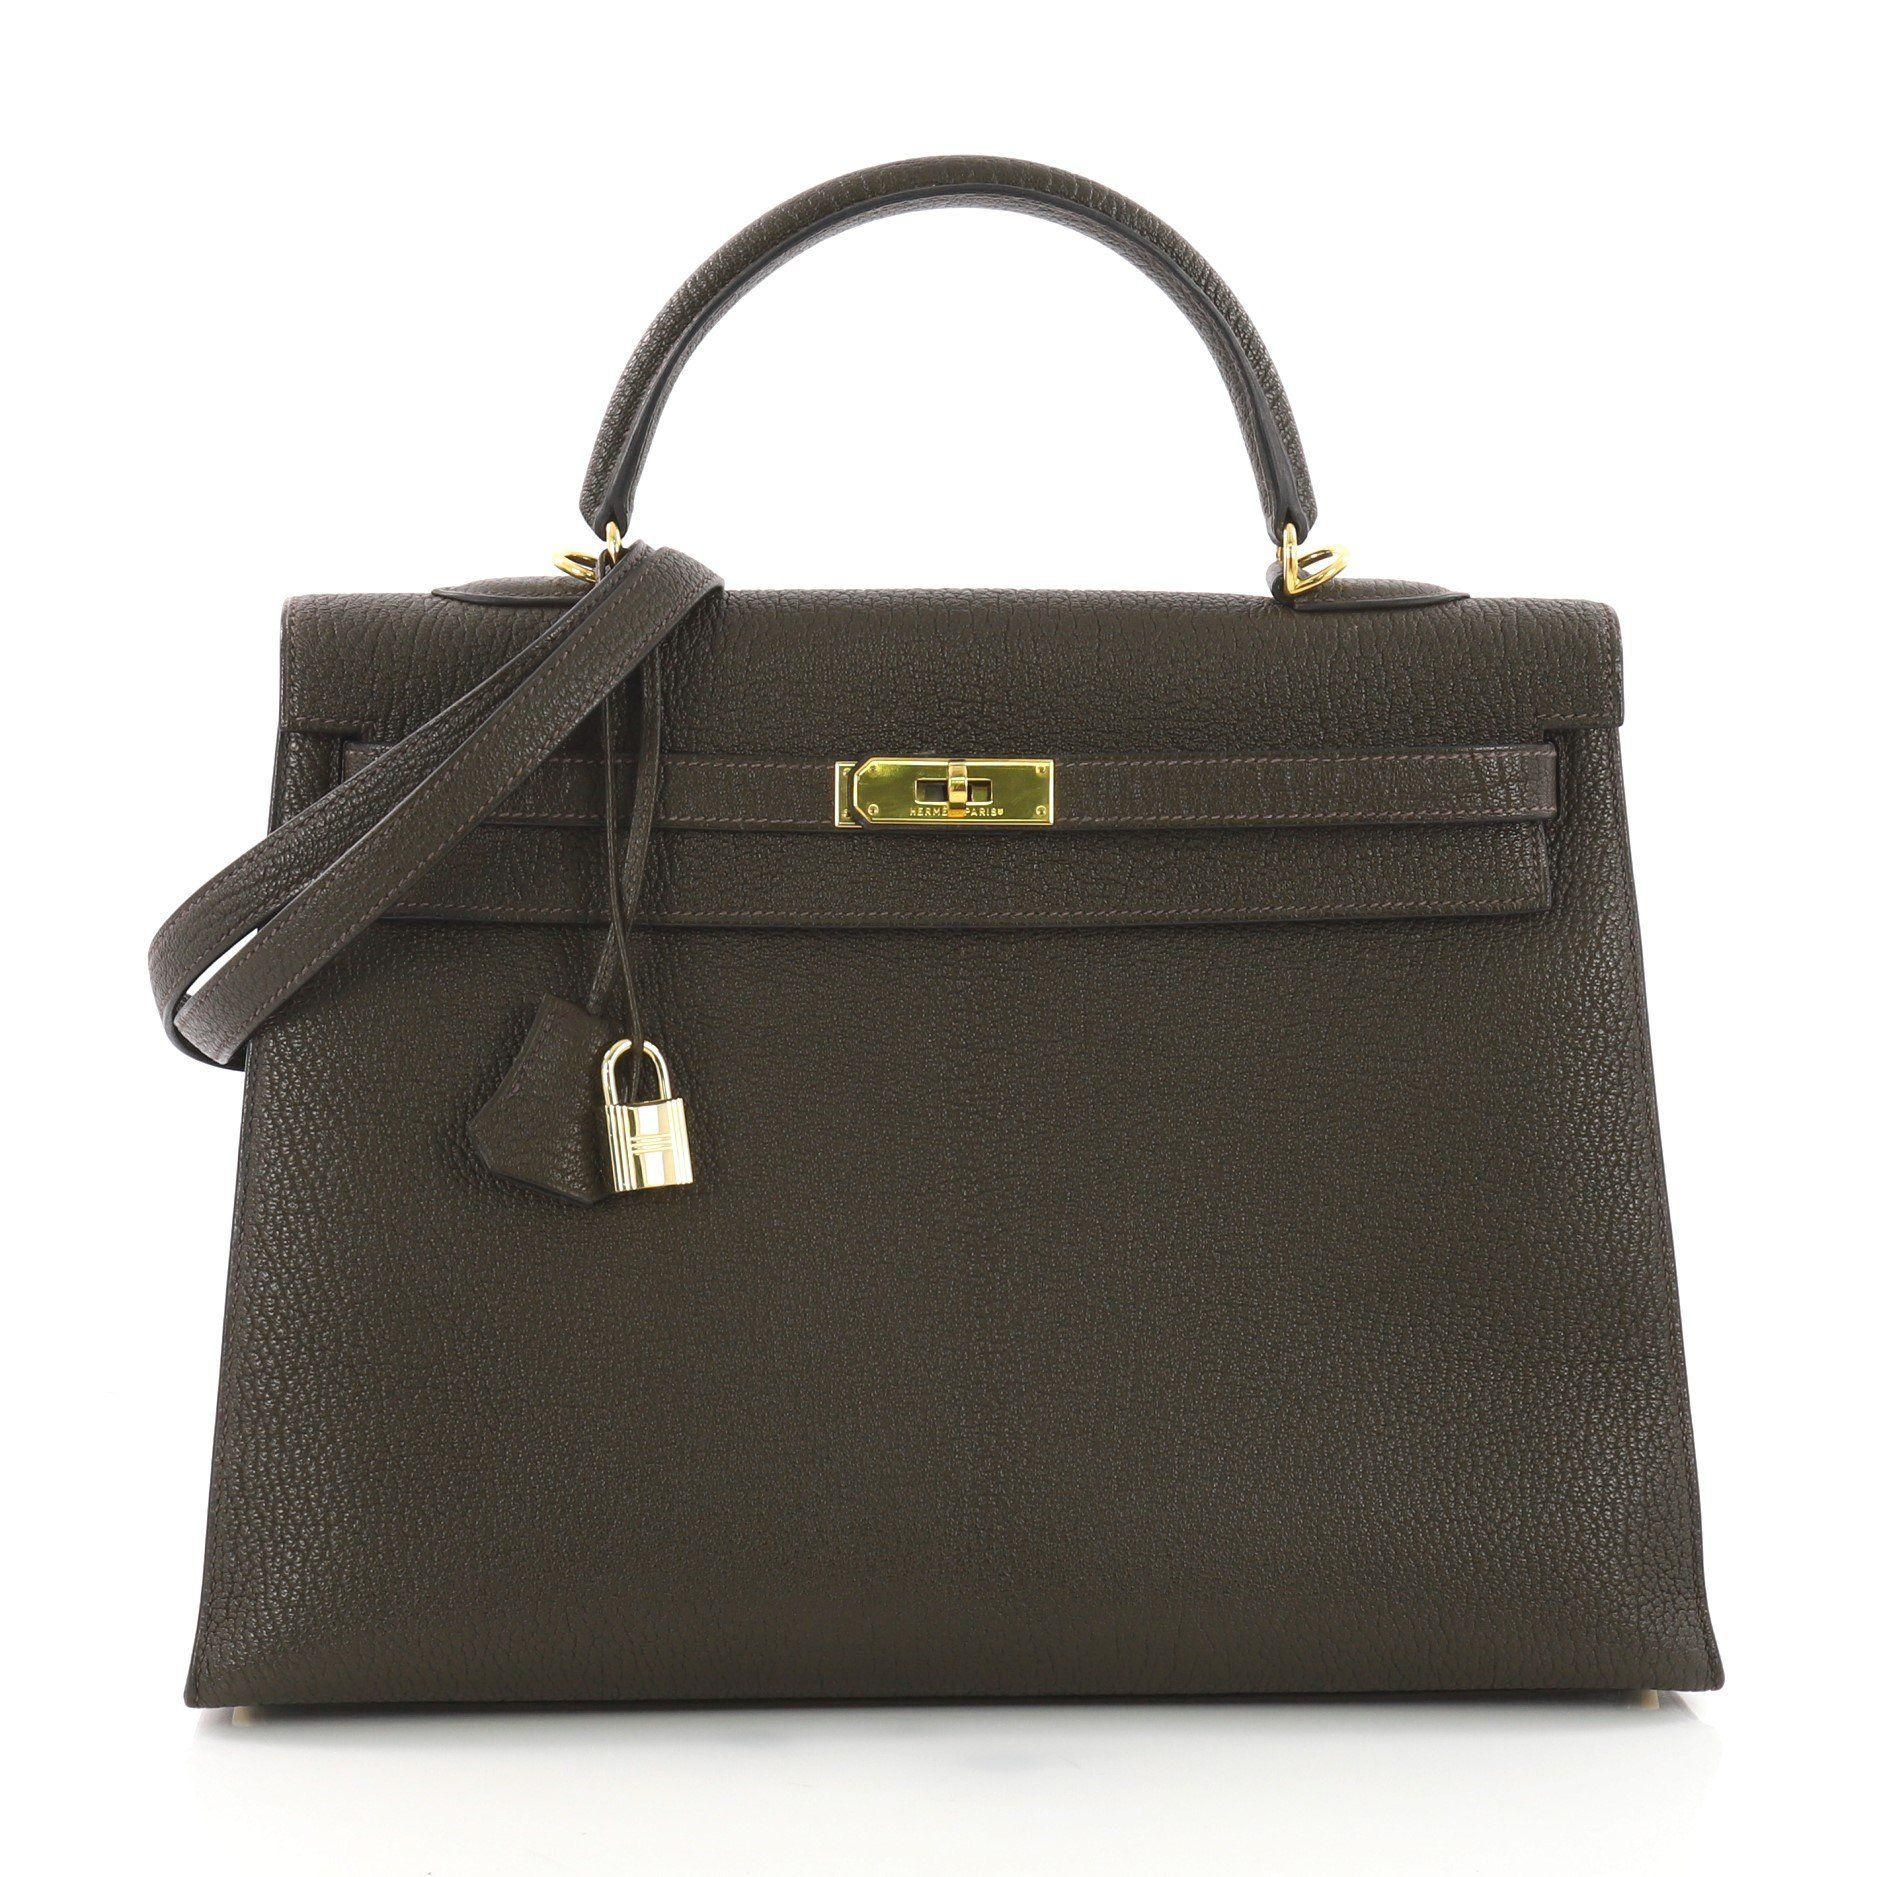 de1bc70eb1ab Hermès. Women s Pre Owned Kelly Handbag Vert Olive Chevre Mangalore With Gold  Hardware 35